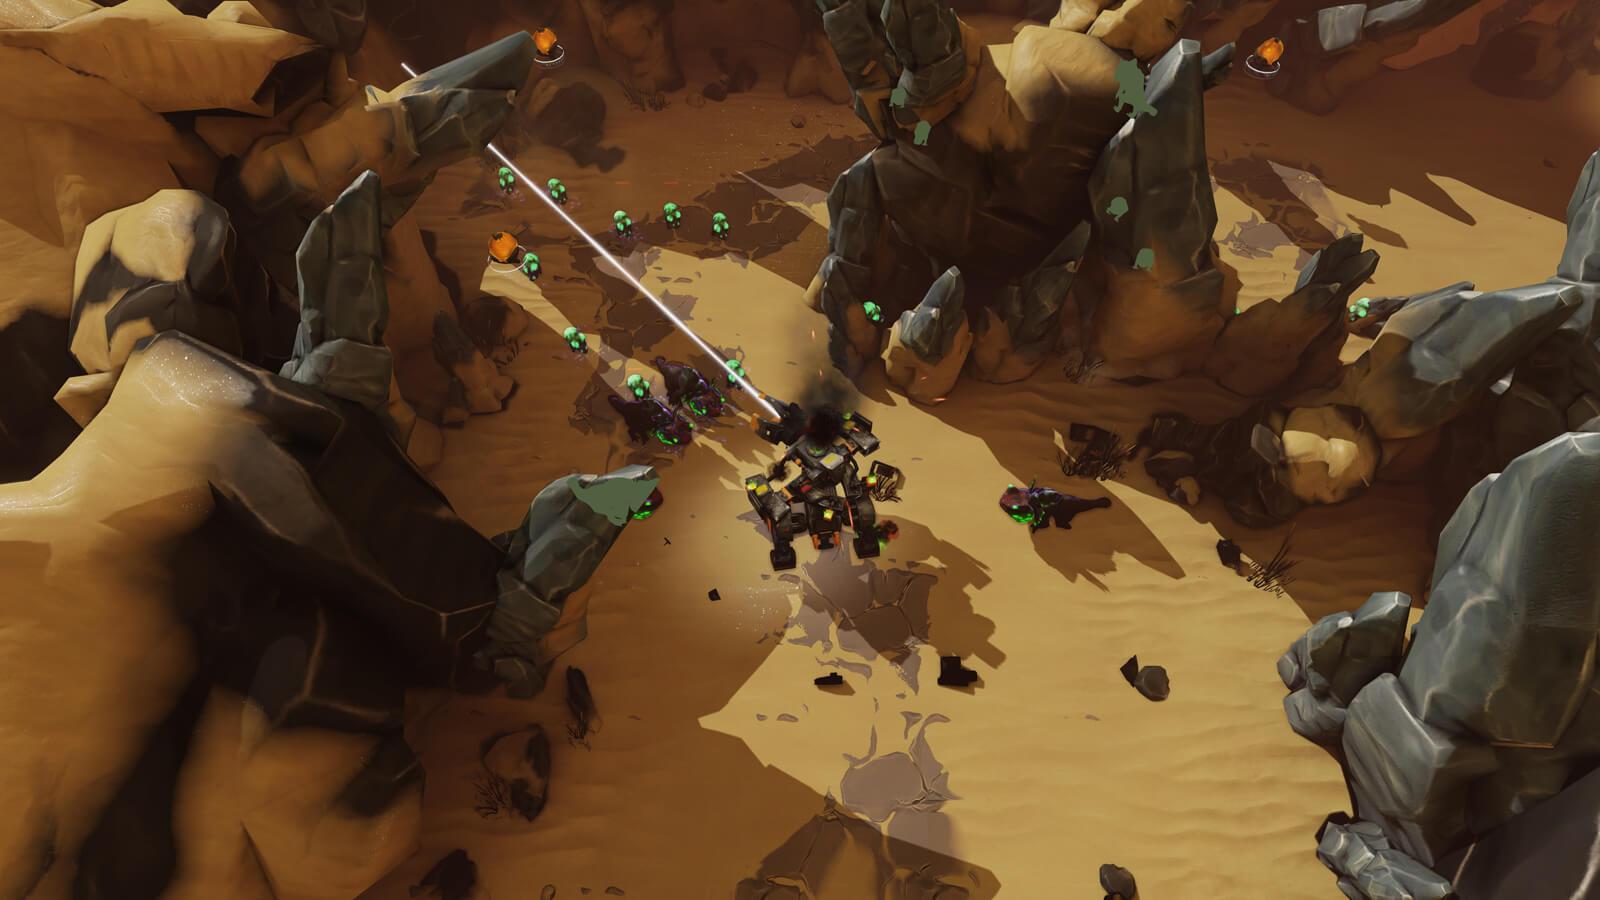 A battle mech shoots a laser at the enemies surrounding it in a desert canyon